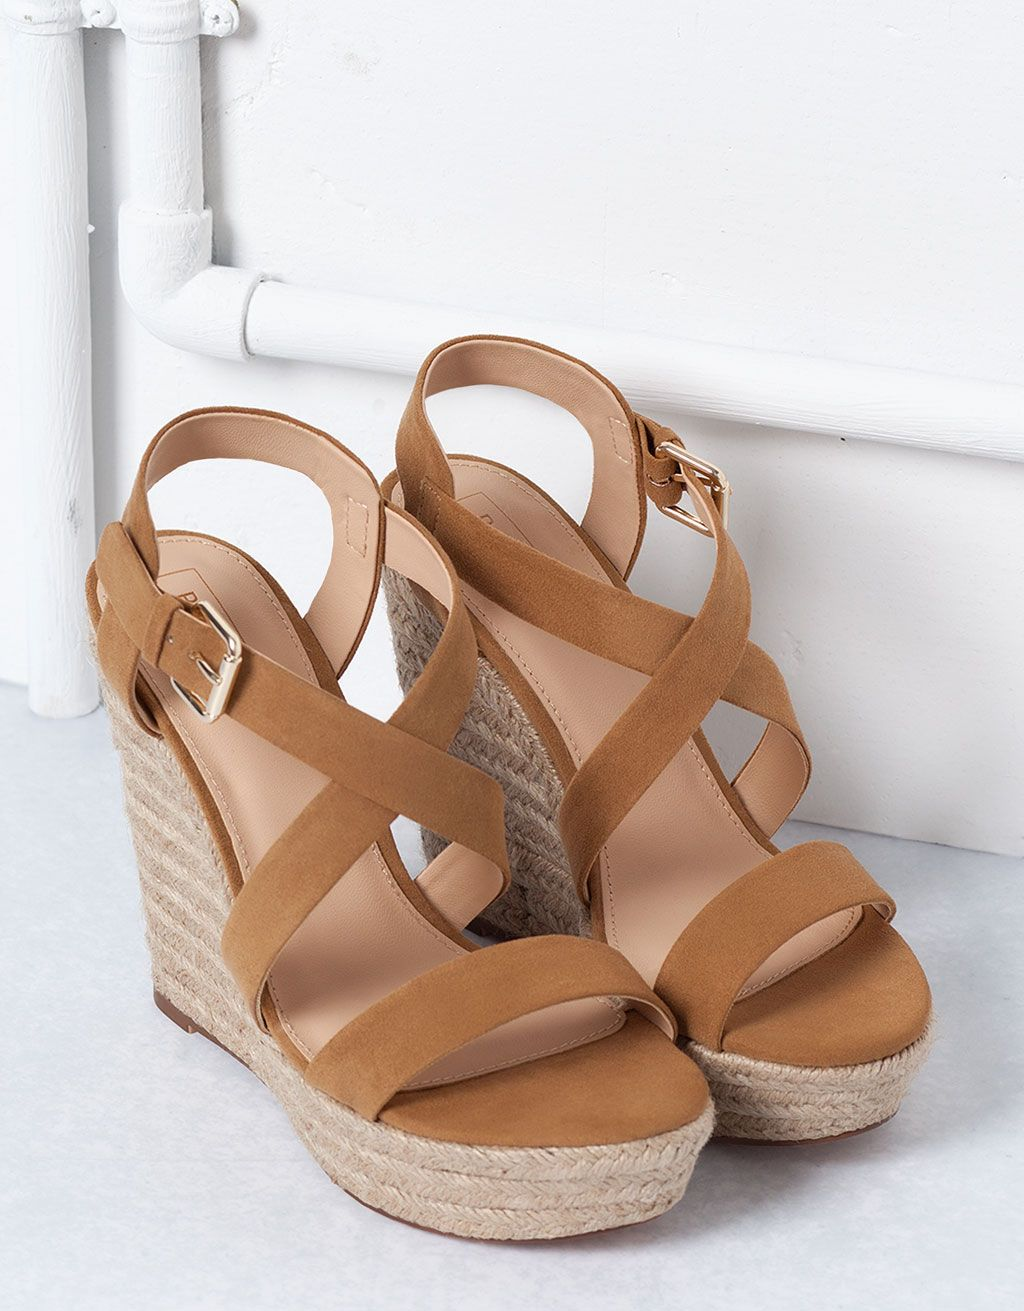 18c5cfa6498 Sandales compensées jute Bershka - Chaussures - Bershka France